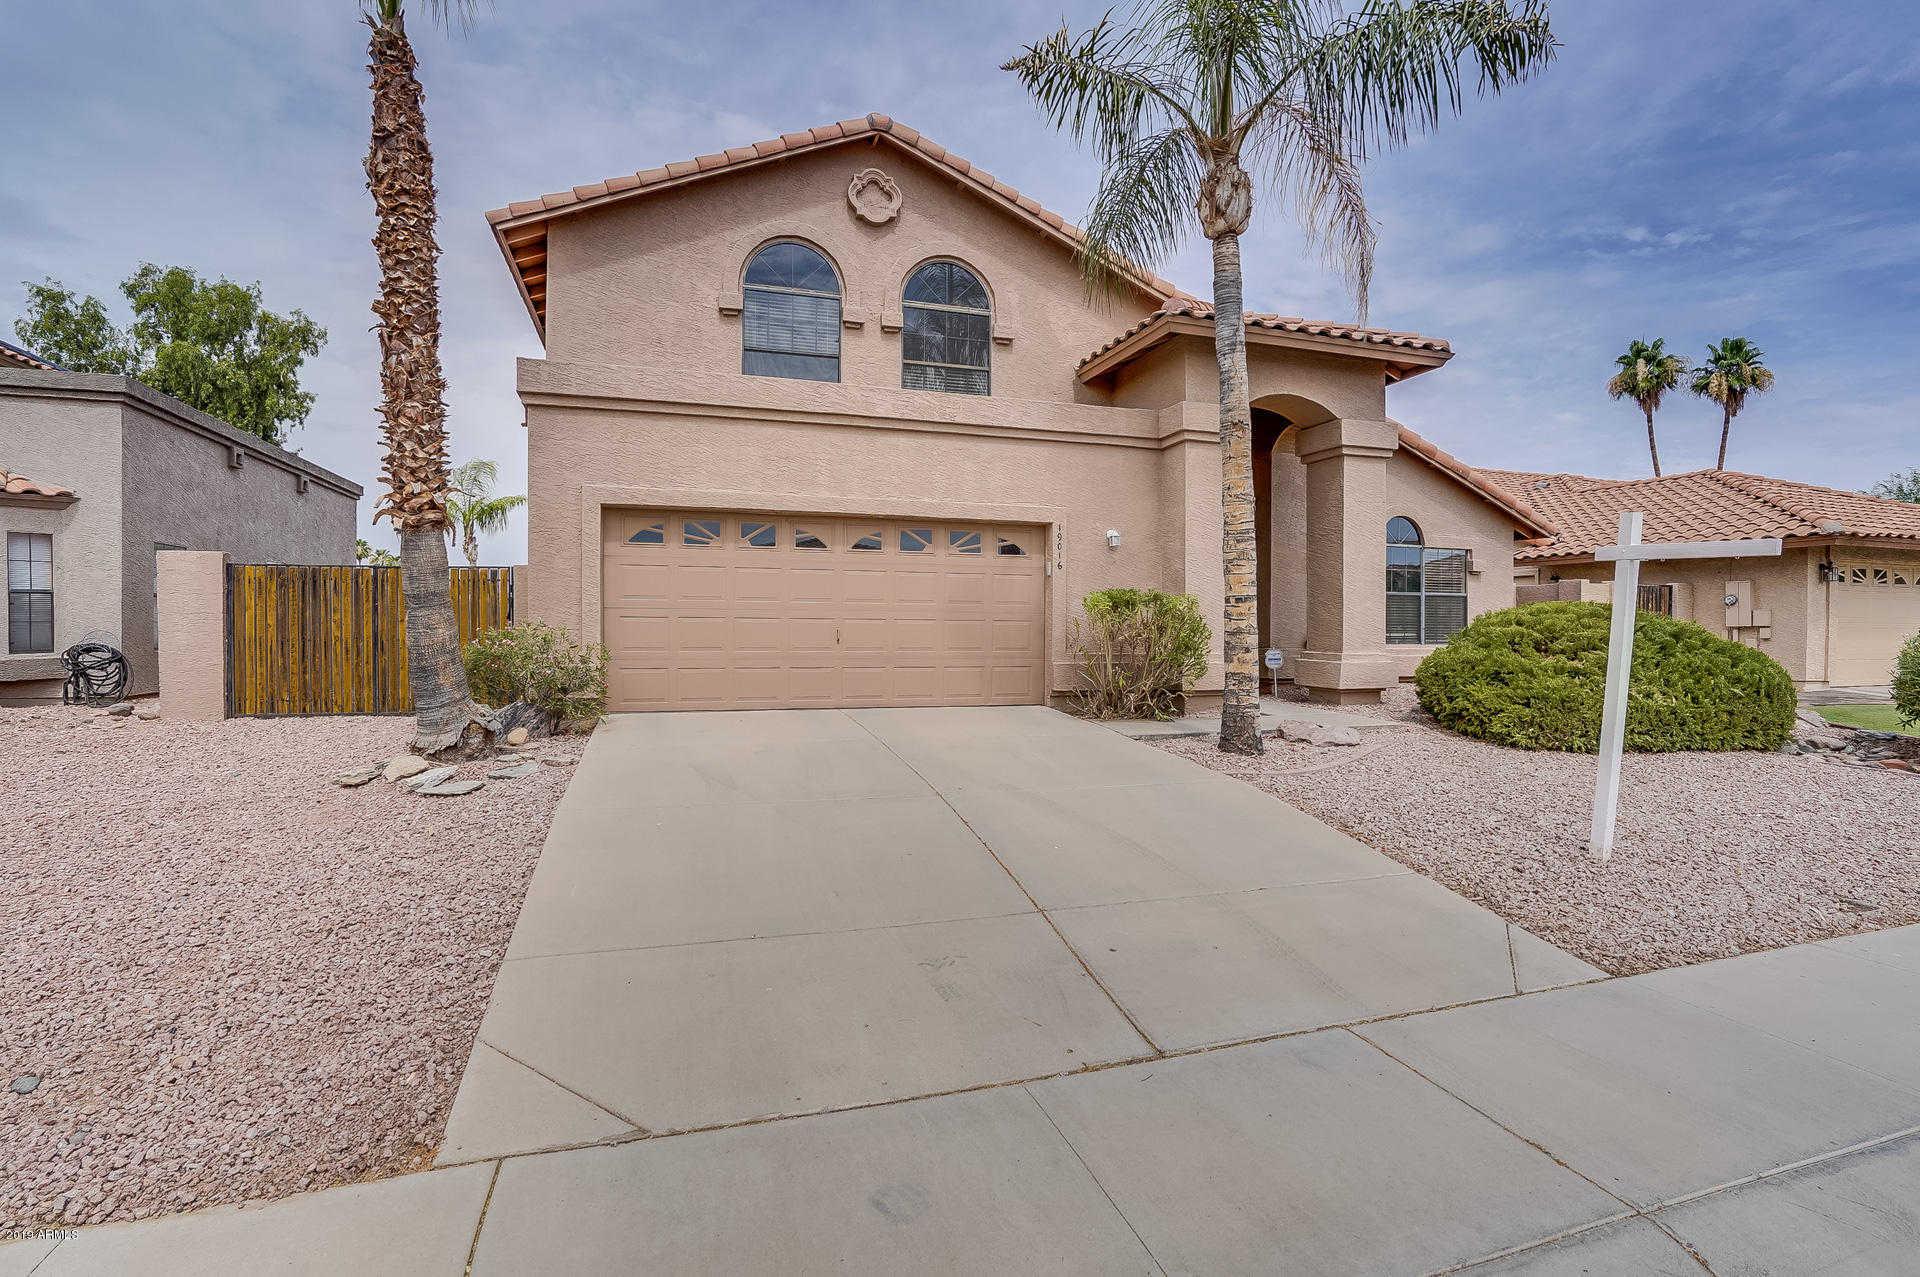 $375,000 - 4Br/3Ba - Home for Sale in Arrowhead Ranch, Glendale